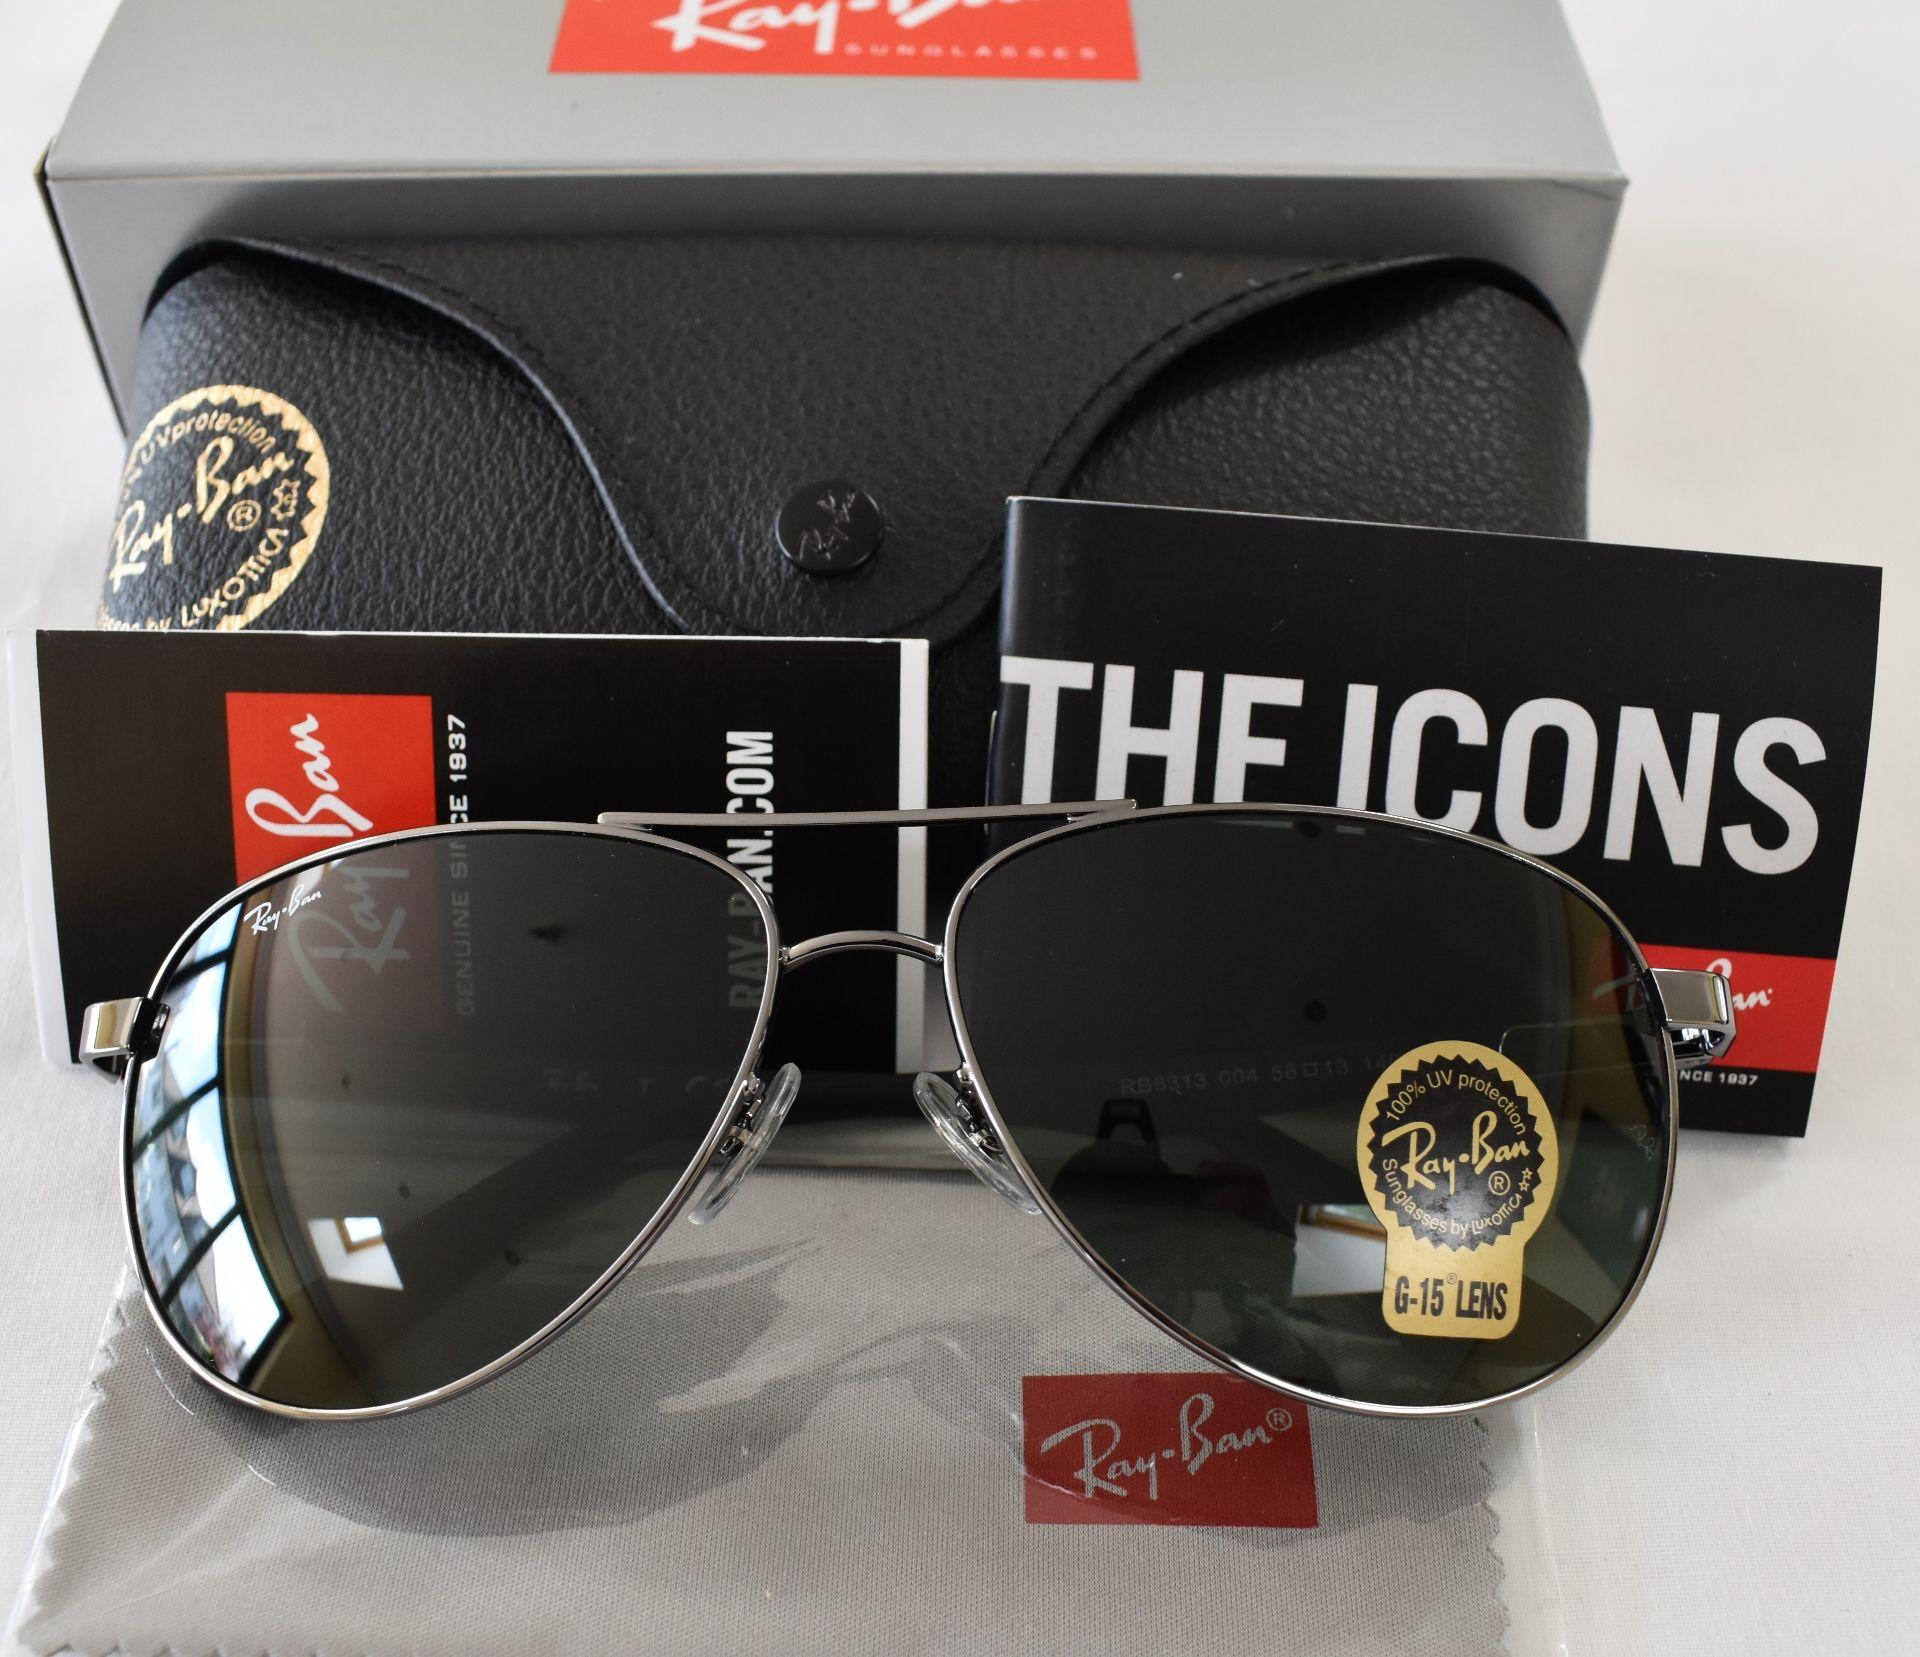 Ray Ban Sunglasses ORB8313 004 *2N - Image 2 of 3